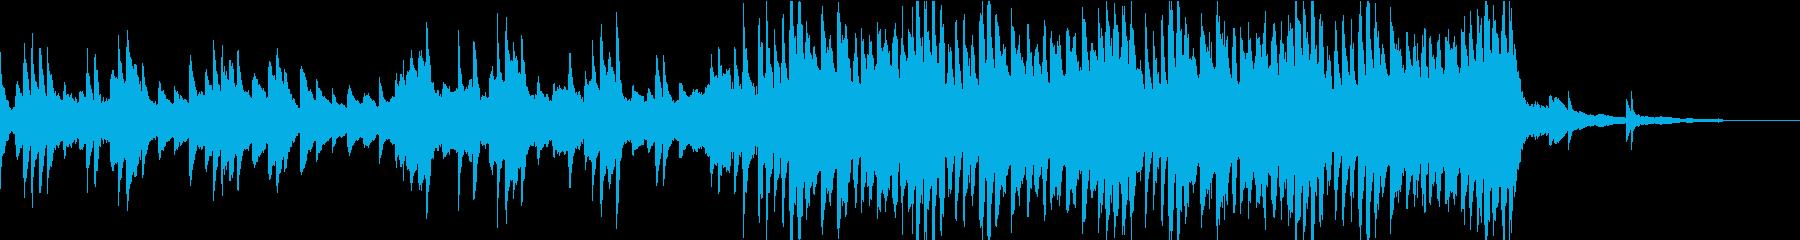 Latin Musicの再生済みの波形